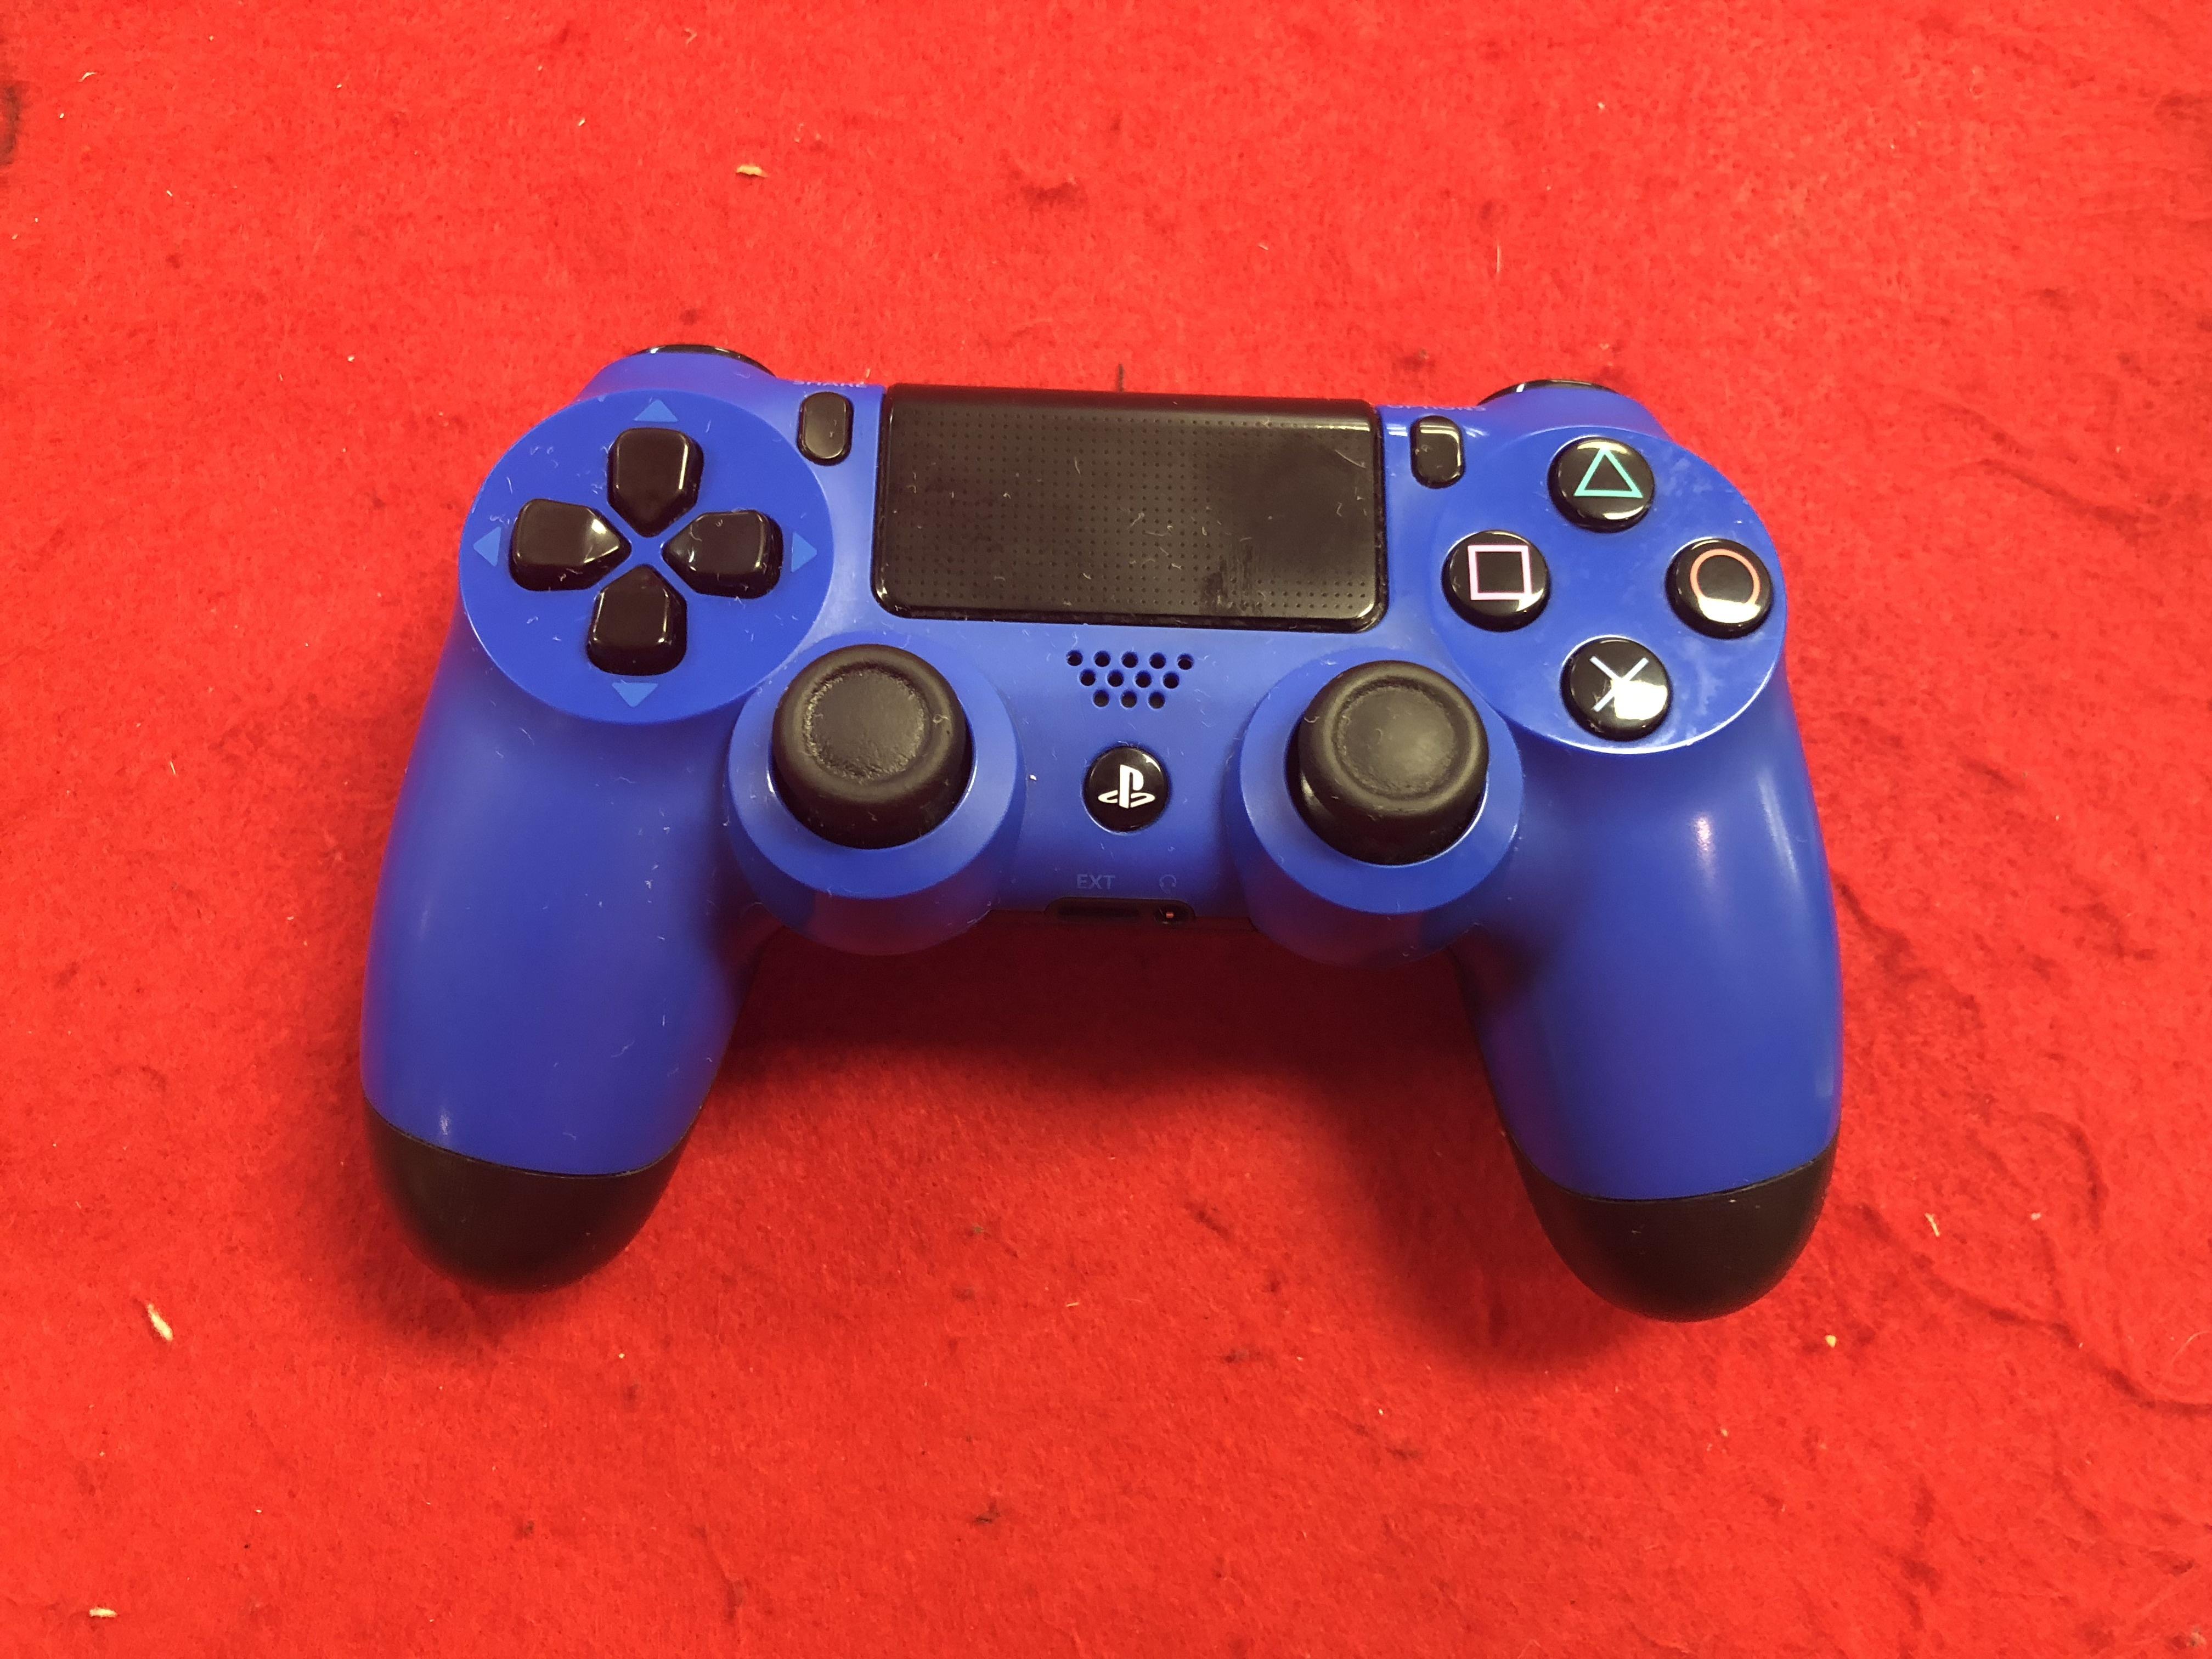 - CUH-ZCT1U - PS4 CONTROLLER GAMES